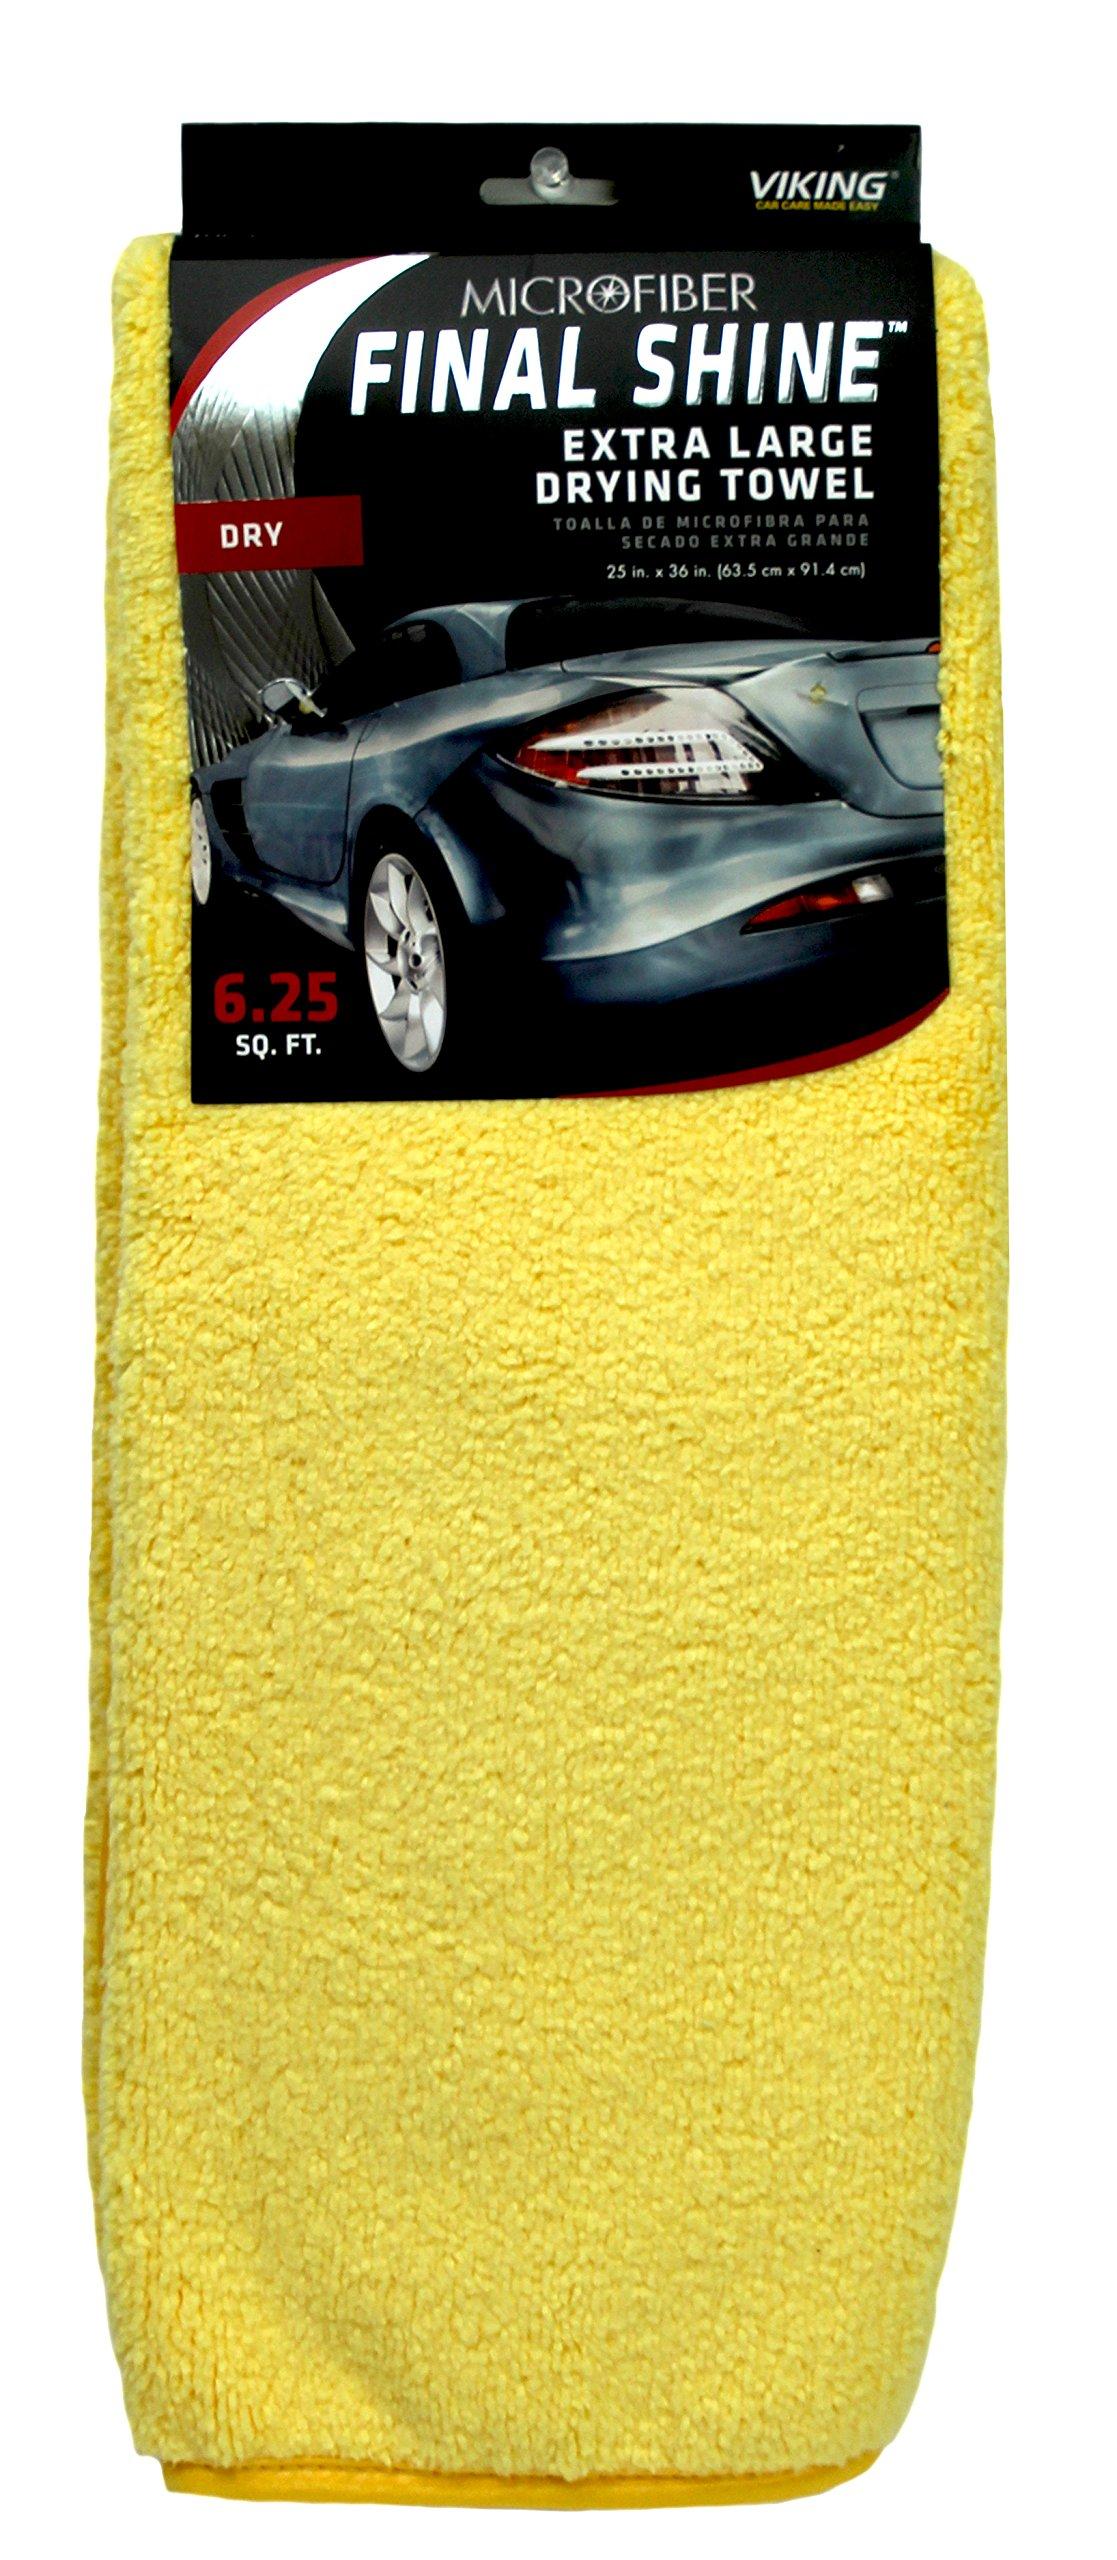 Viking Extra Large Microfiber Drying Towel - 6.25 Square Feet 10